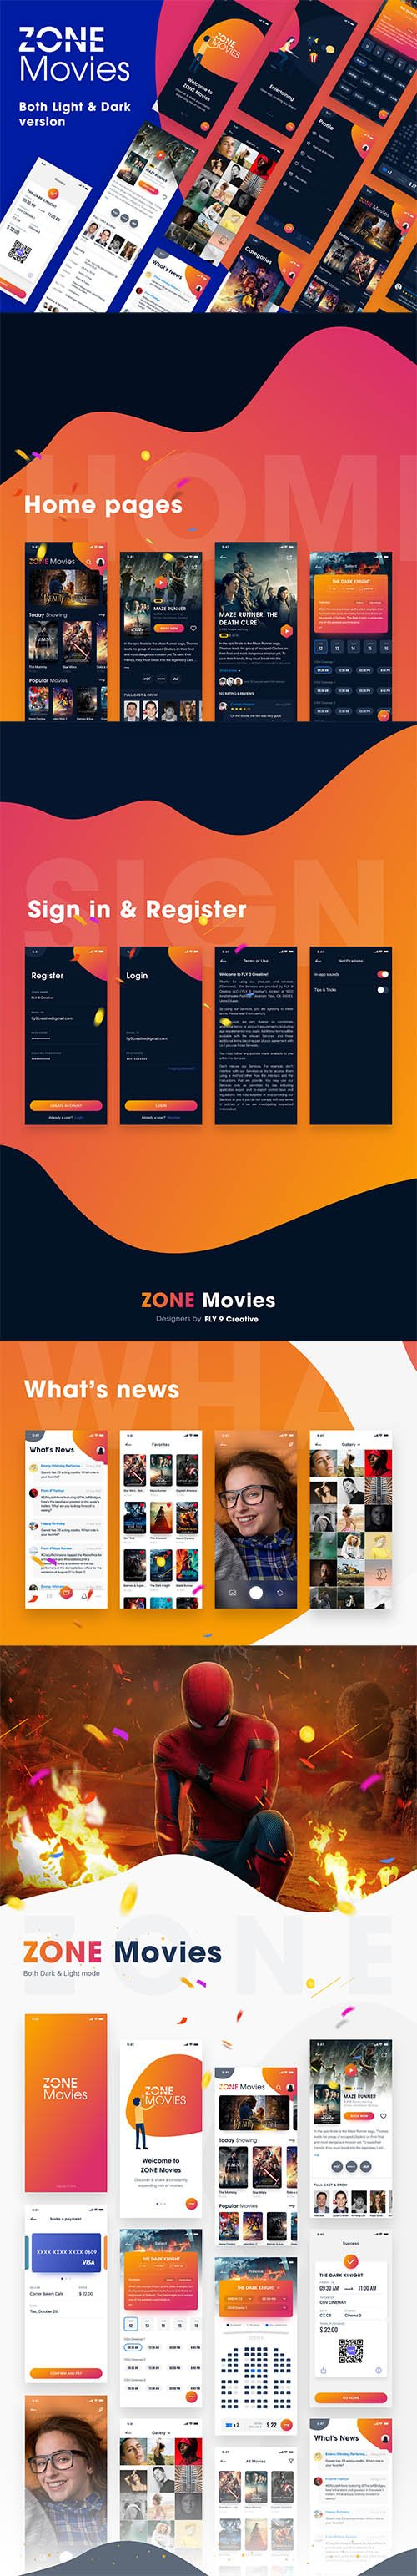 NEW - ZONE Movies - Both Dark & Light Version